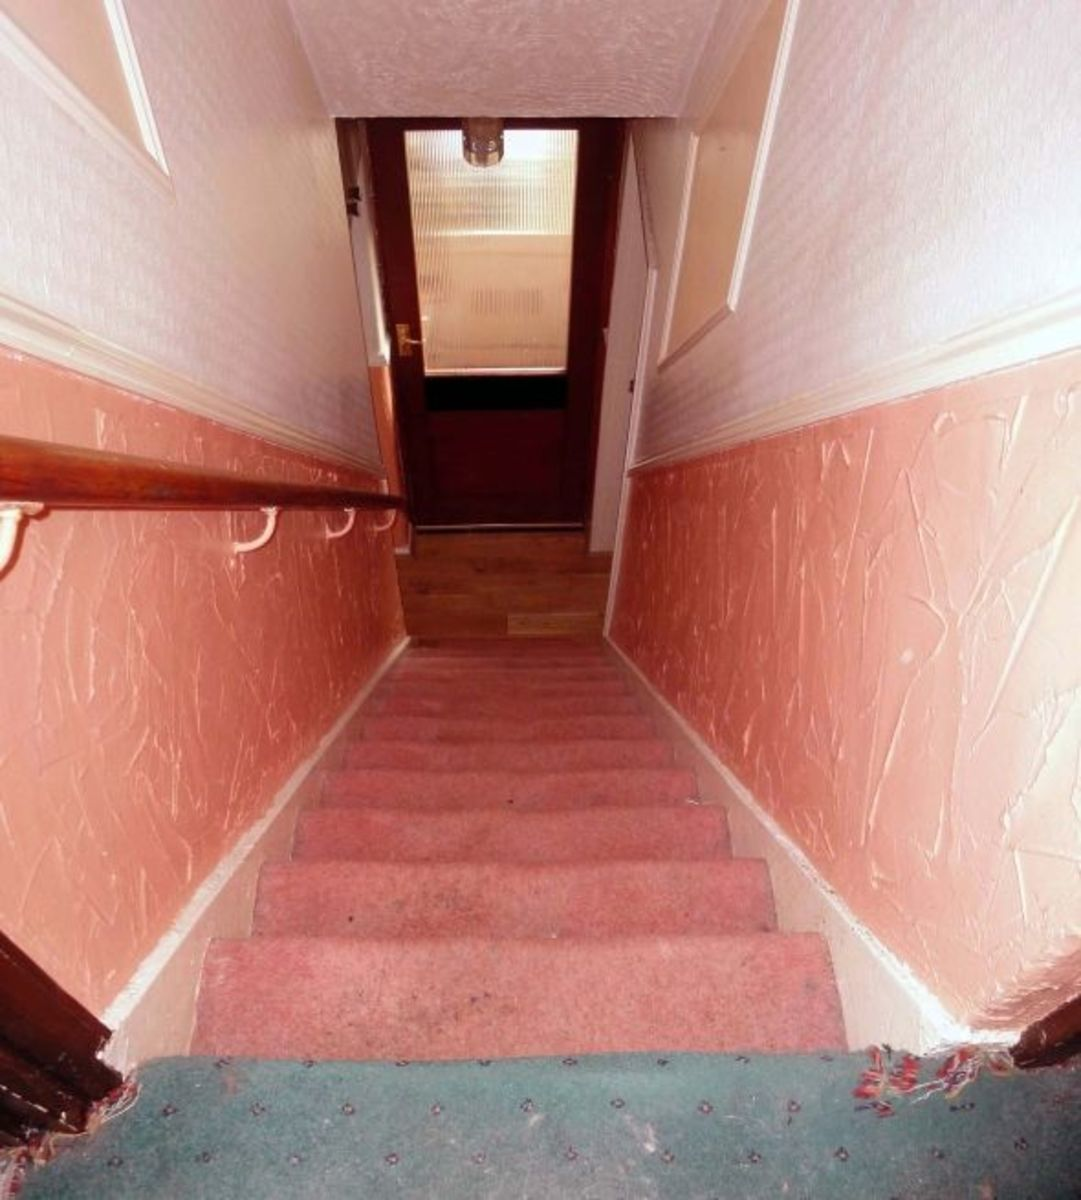 Original stairs with carpet